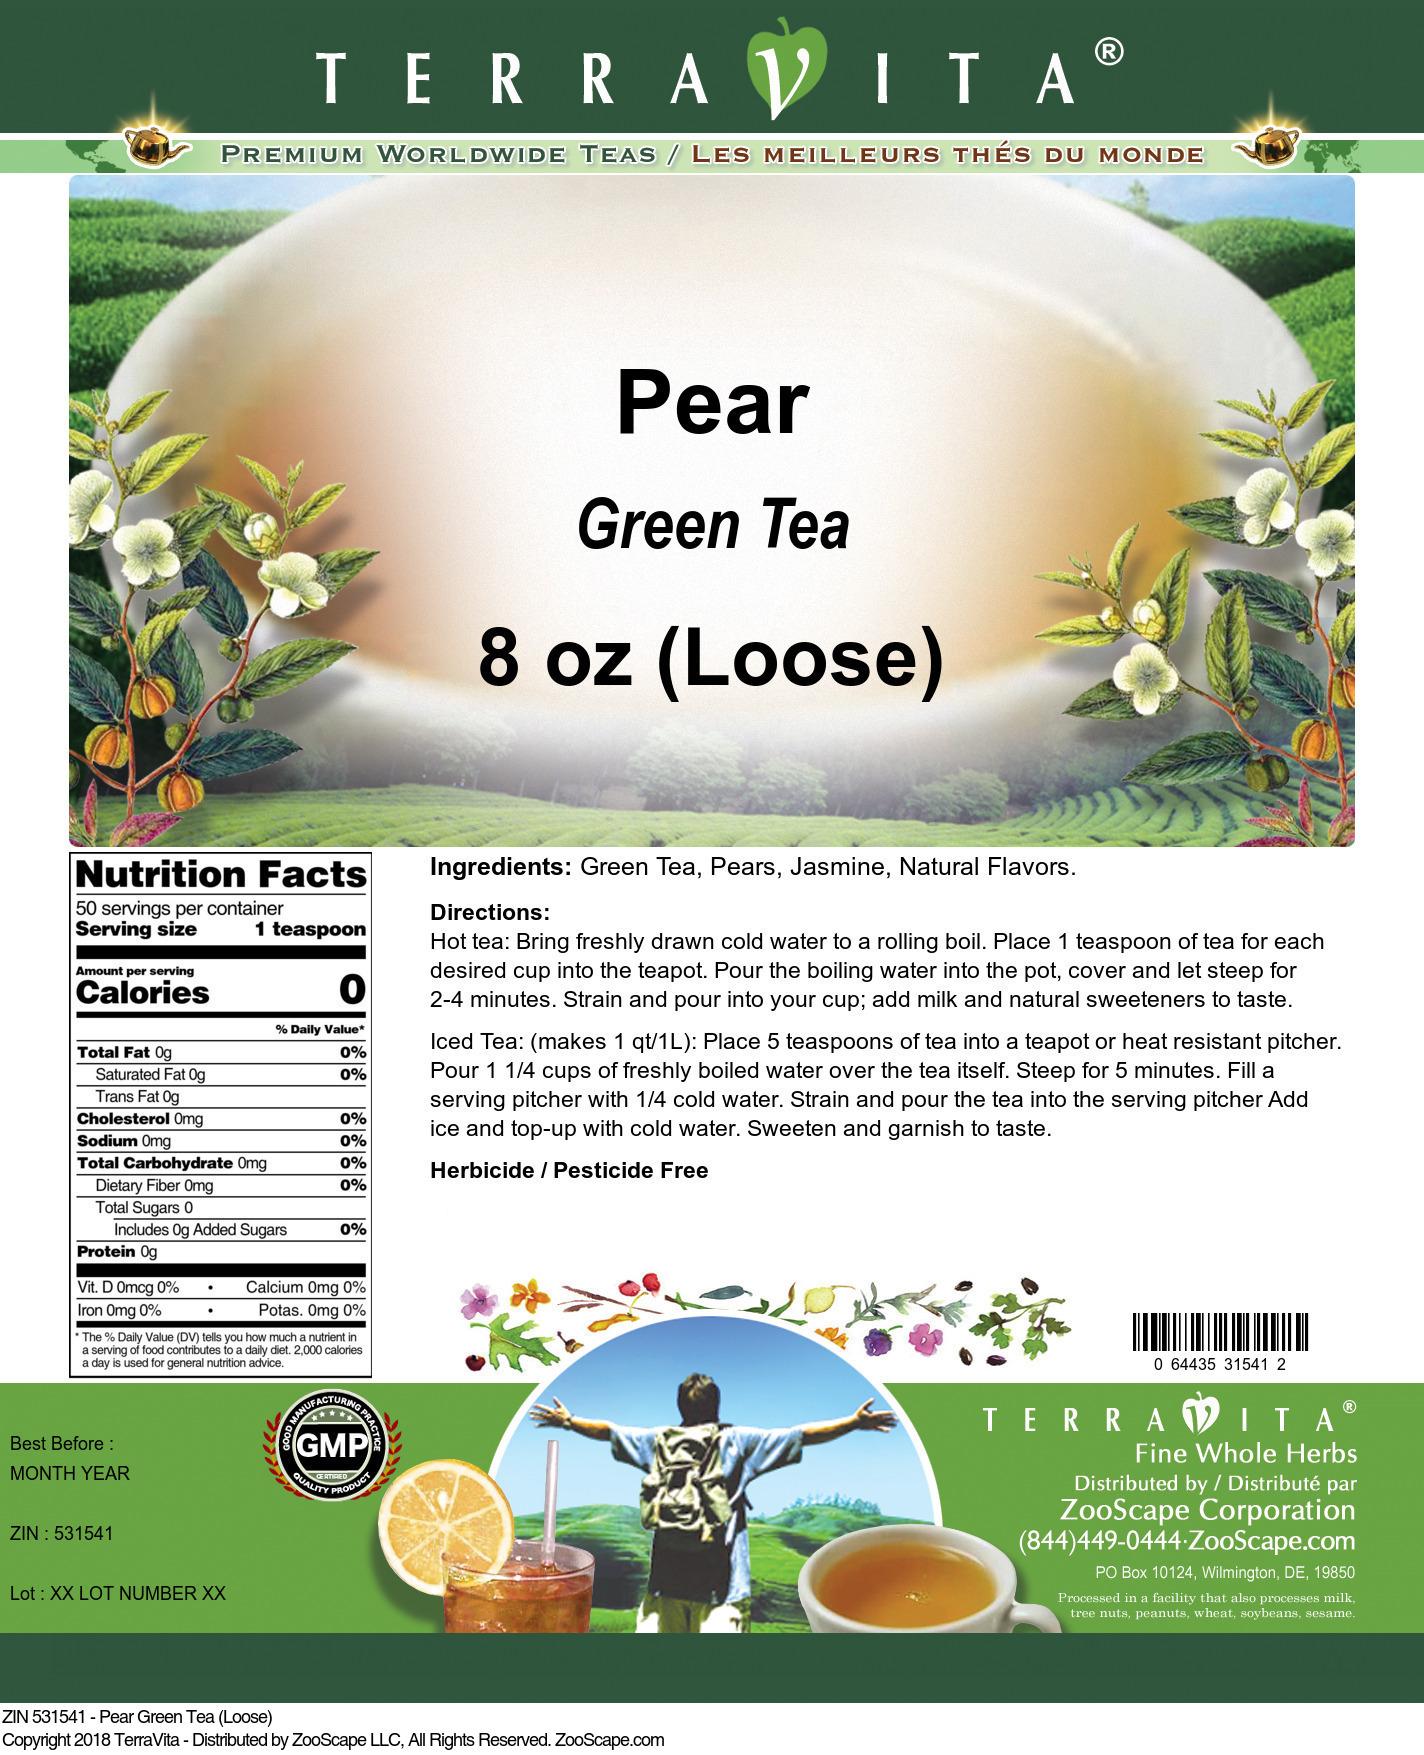 Pear Green Tea (Loose)